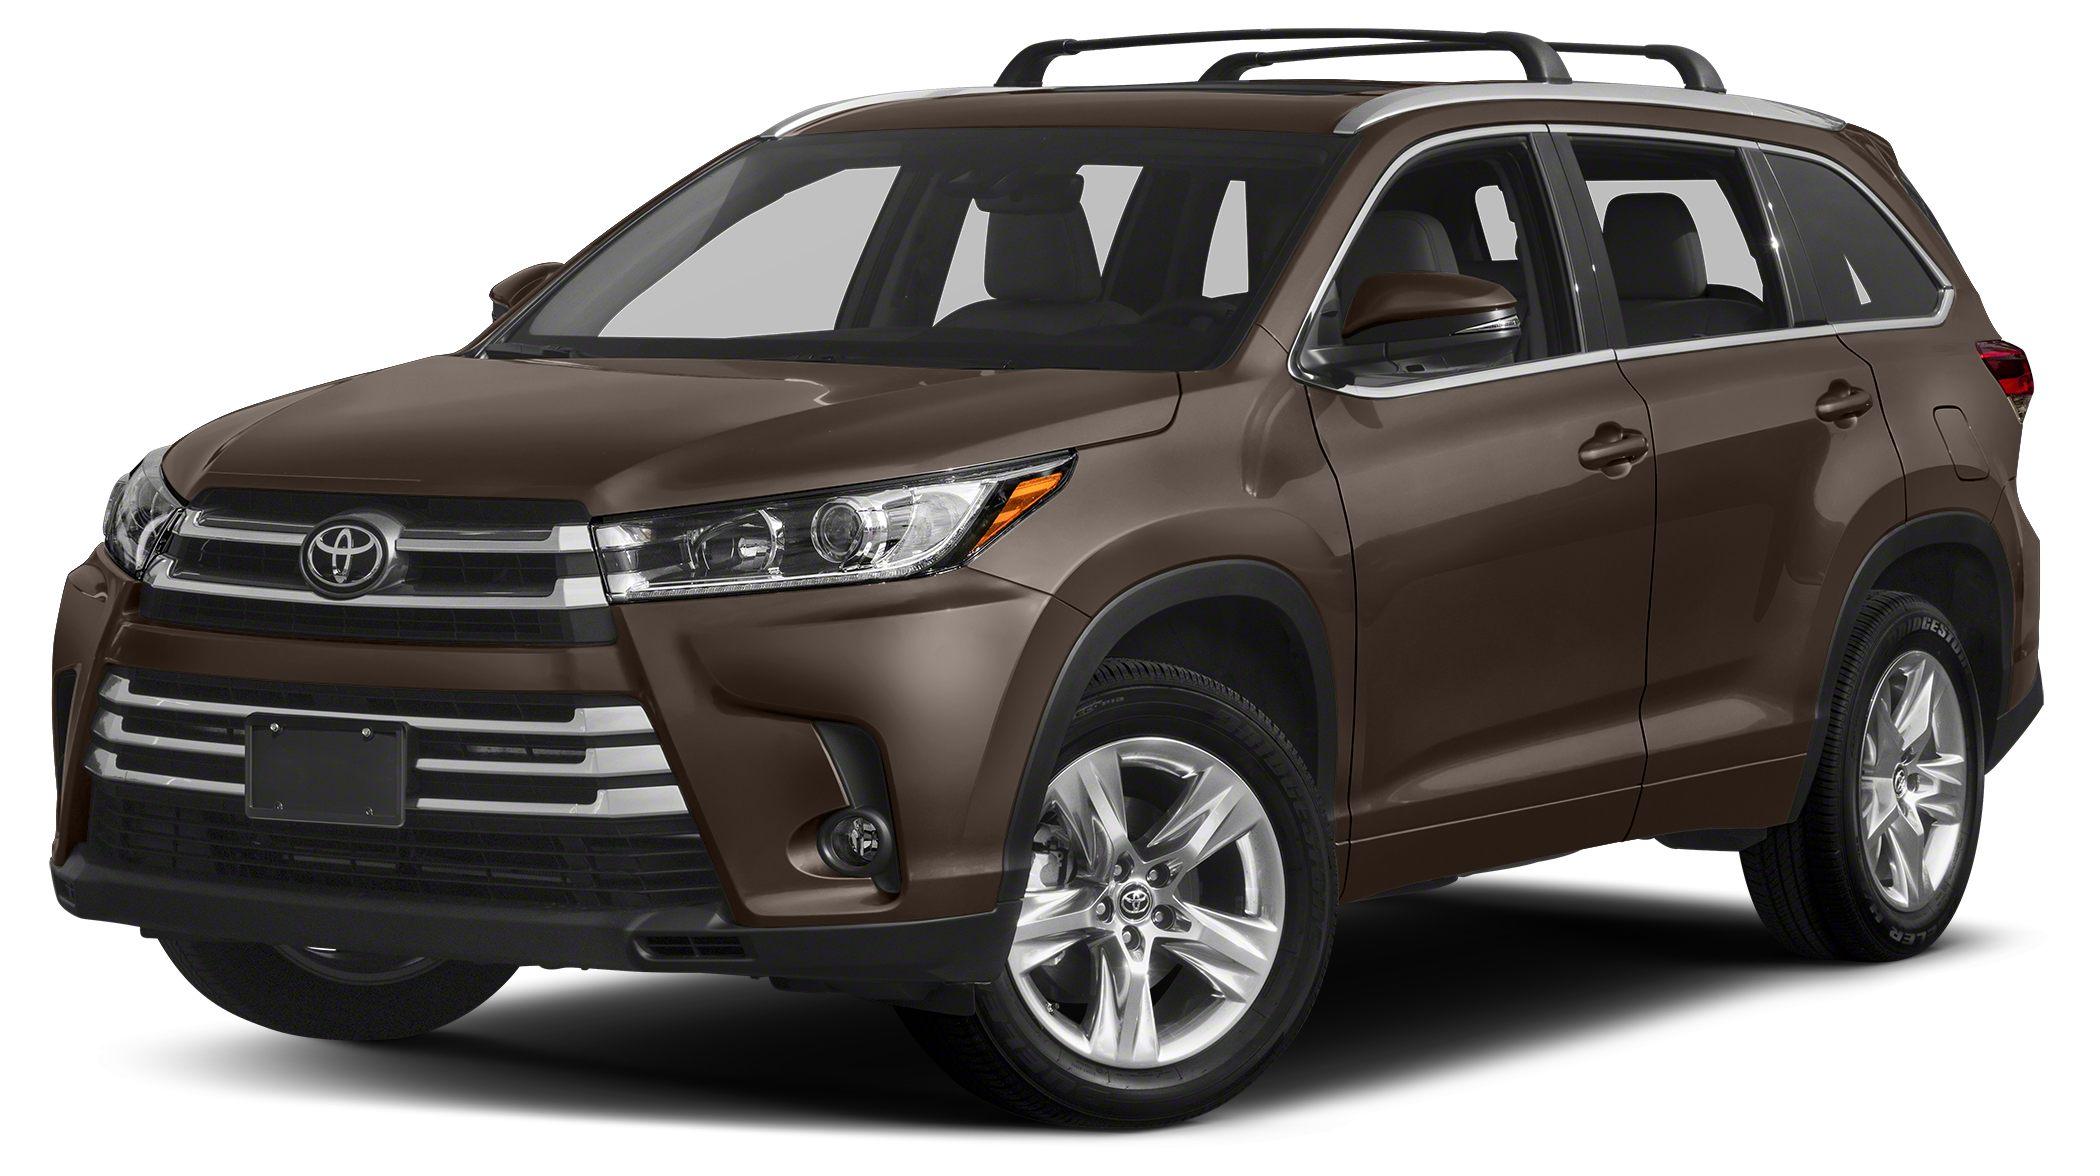 2018 Toyota Highlander Limited Platinum Heated Leather Seats Moonroof Nav System Third Row Seat